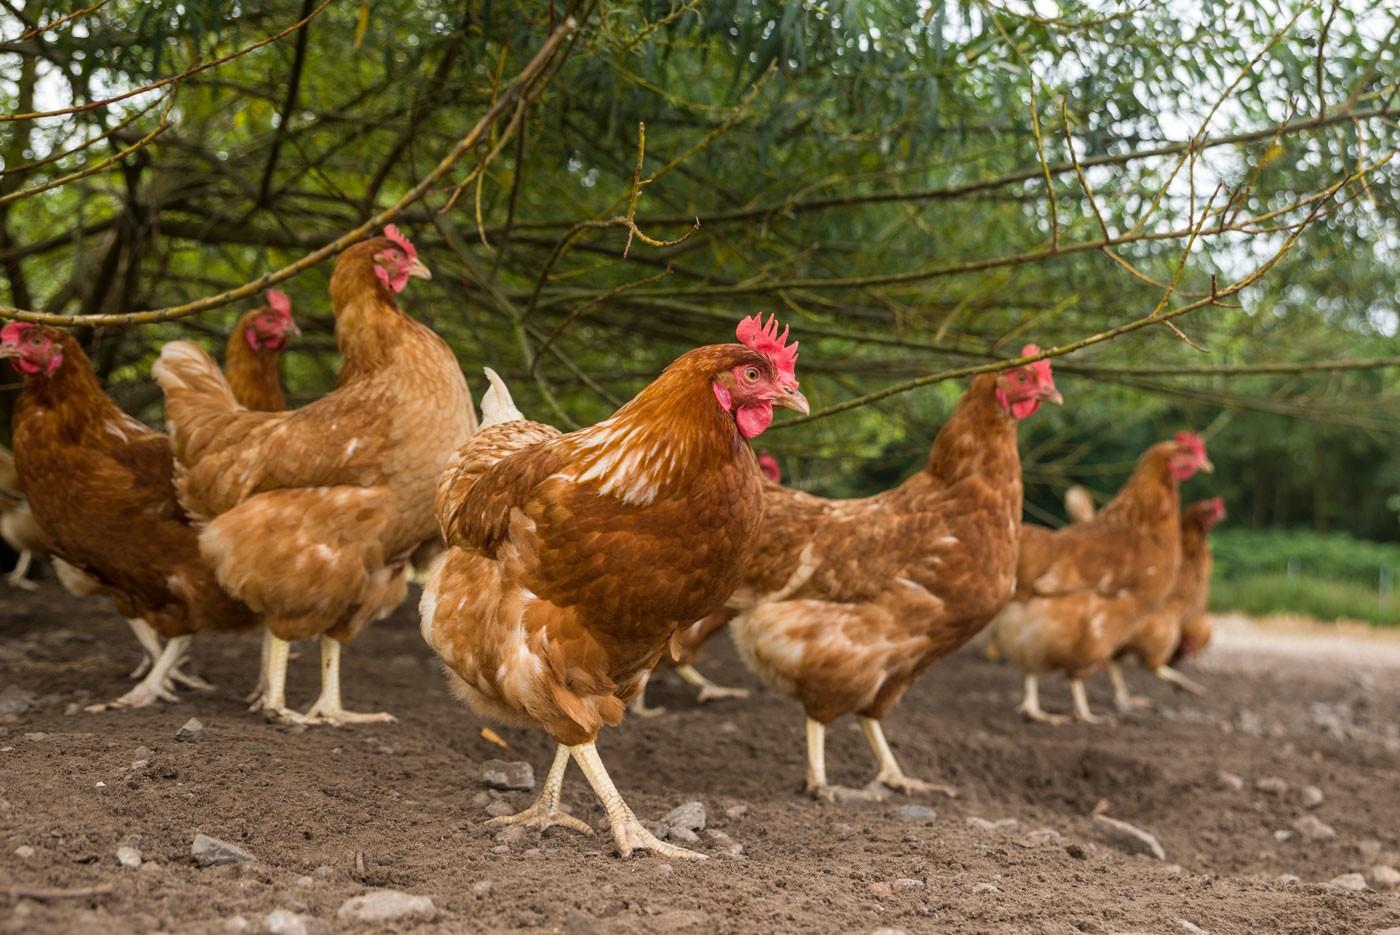 chickens_1-0a2b91b